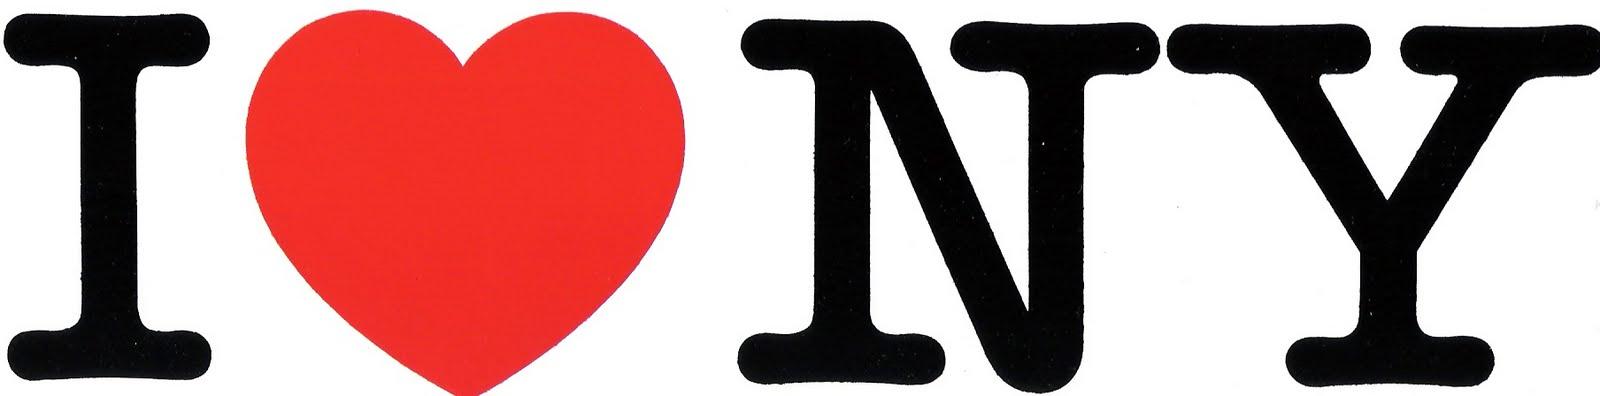 Logo de I love NYC de Milton Glaser